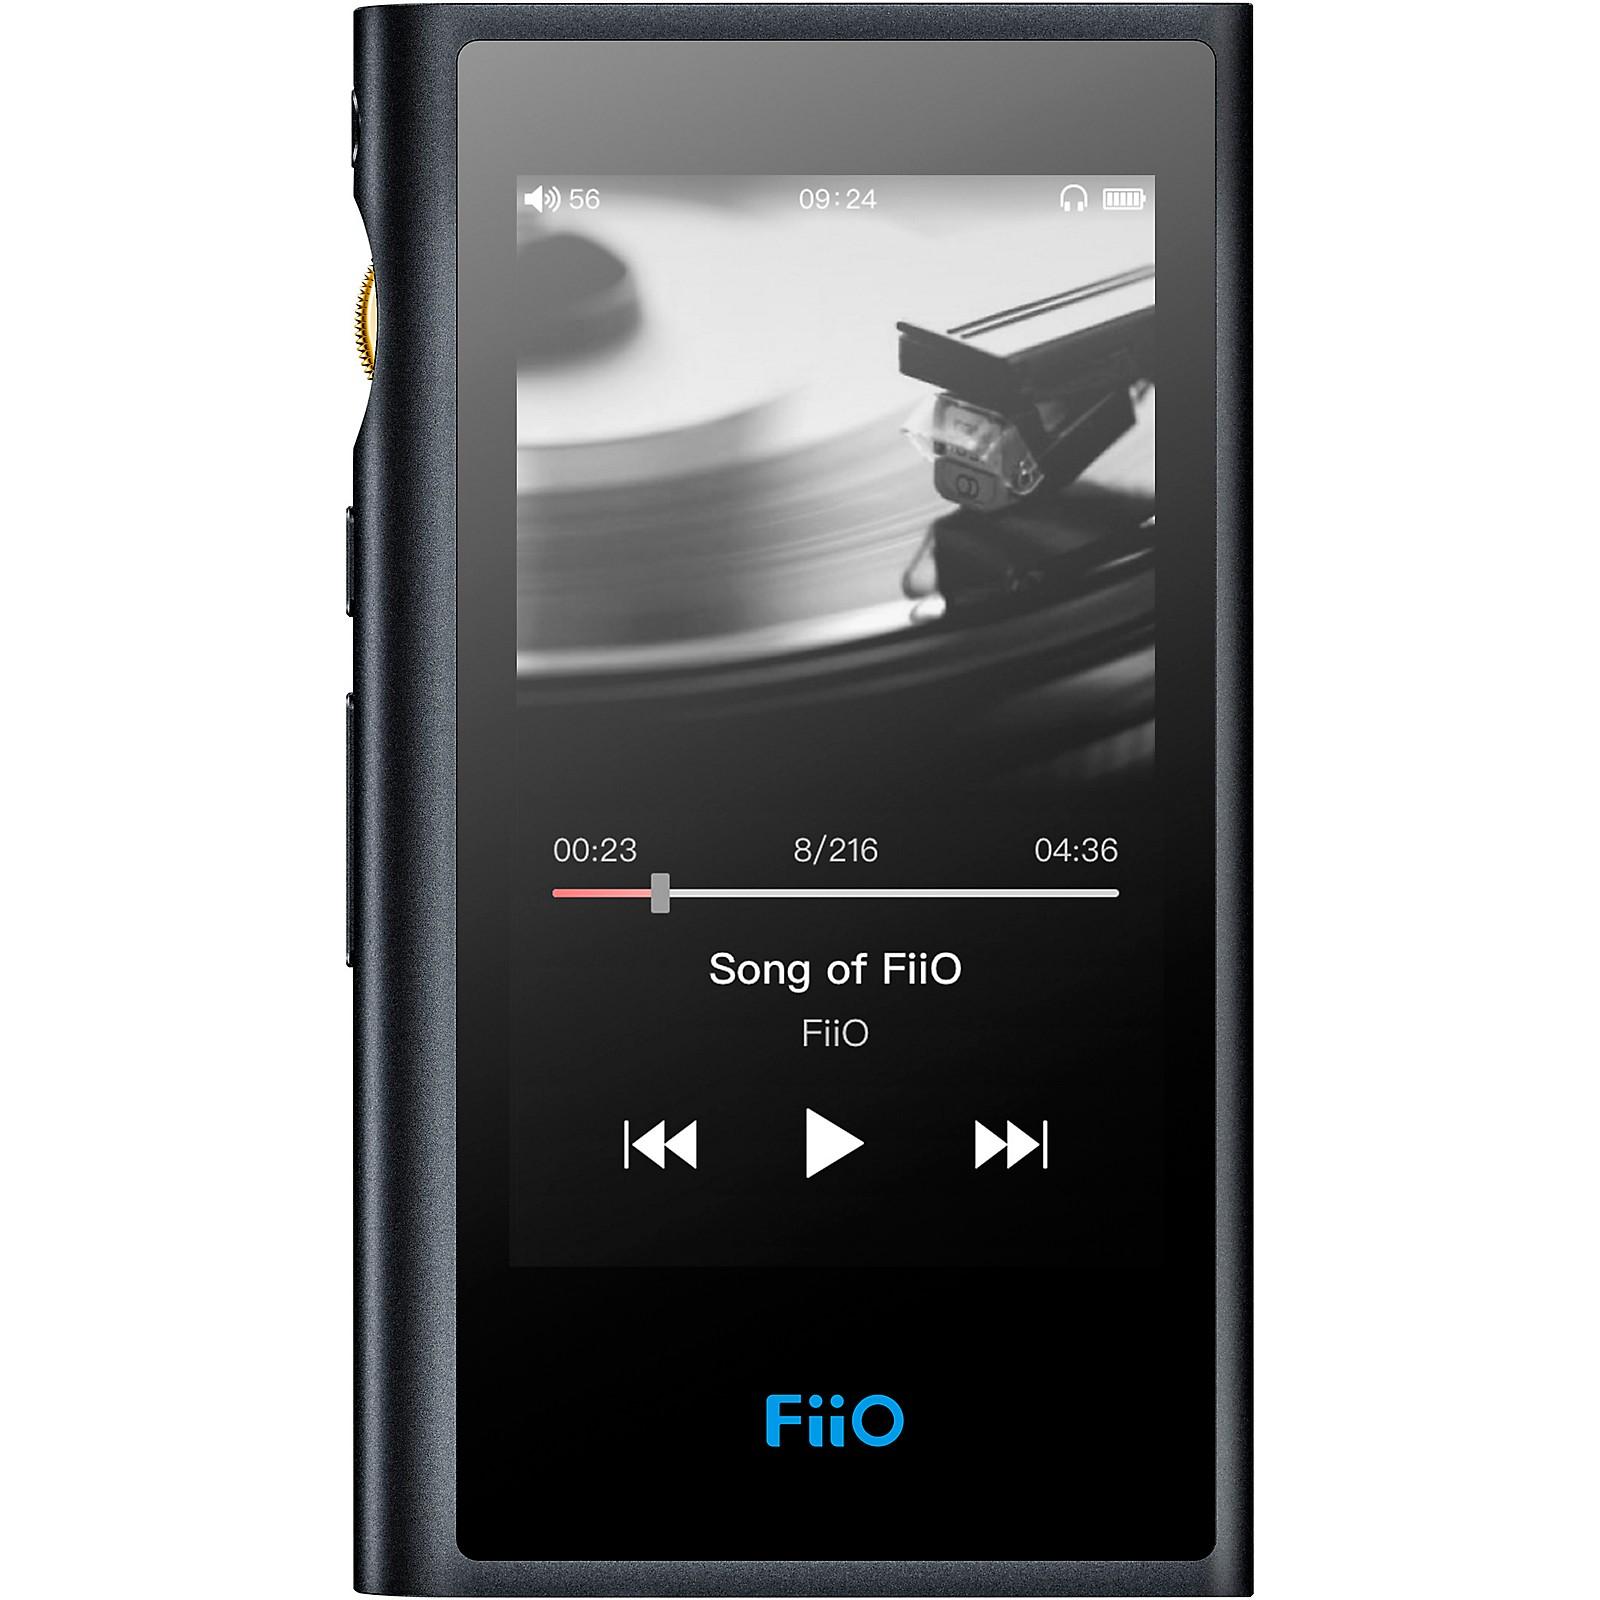 FiiO M9 Portable High-Resolution Audio Player with Bluetooth 4.2 - Black